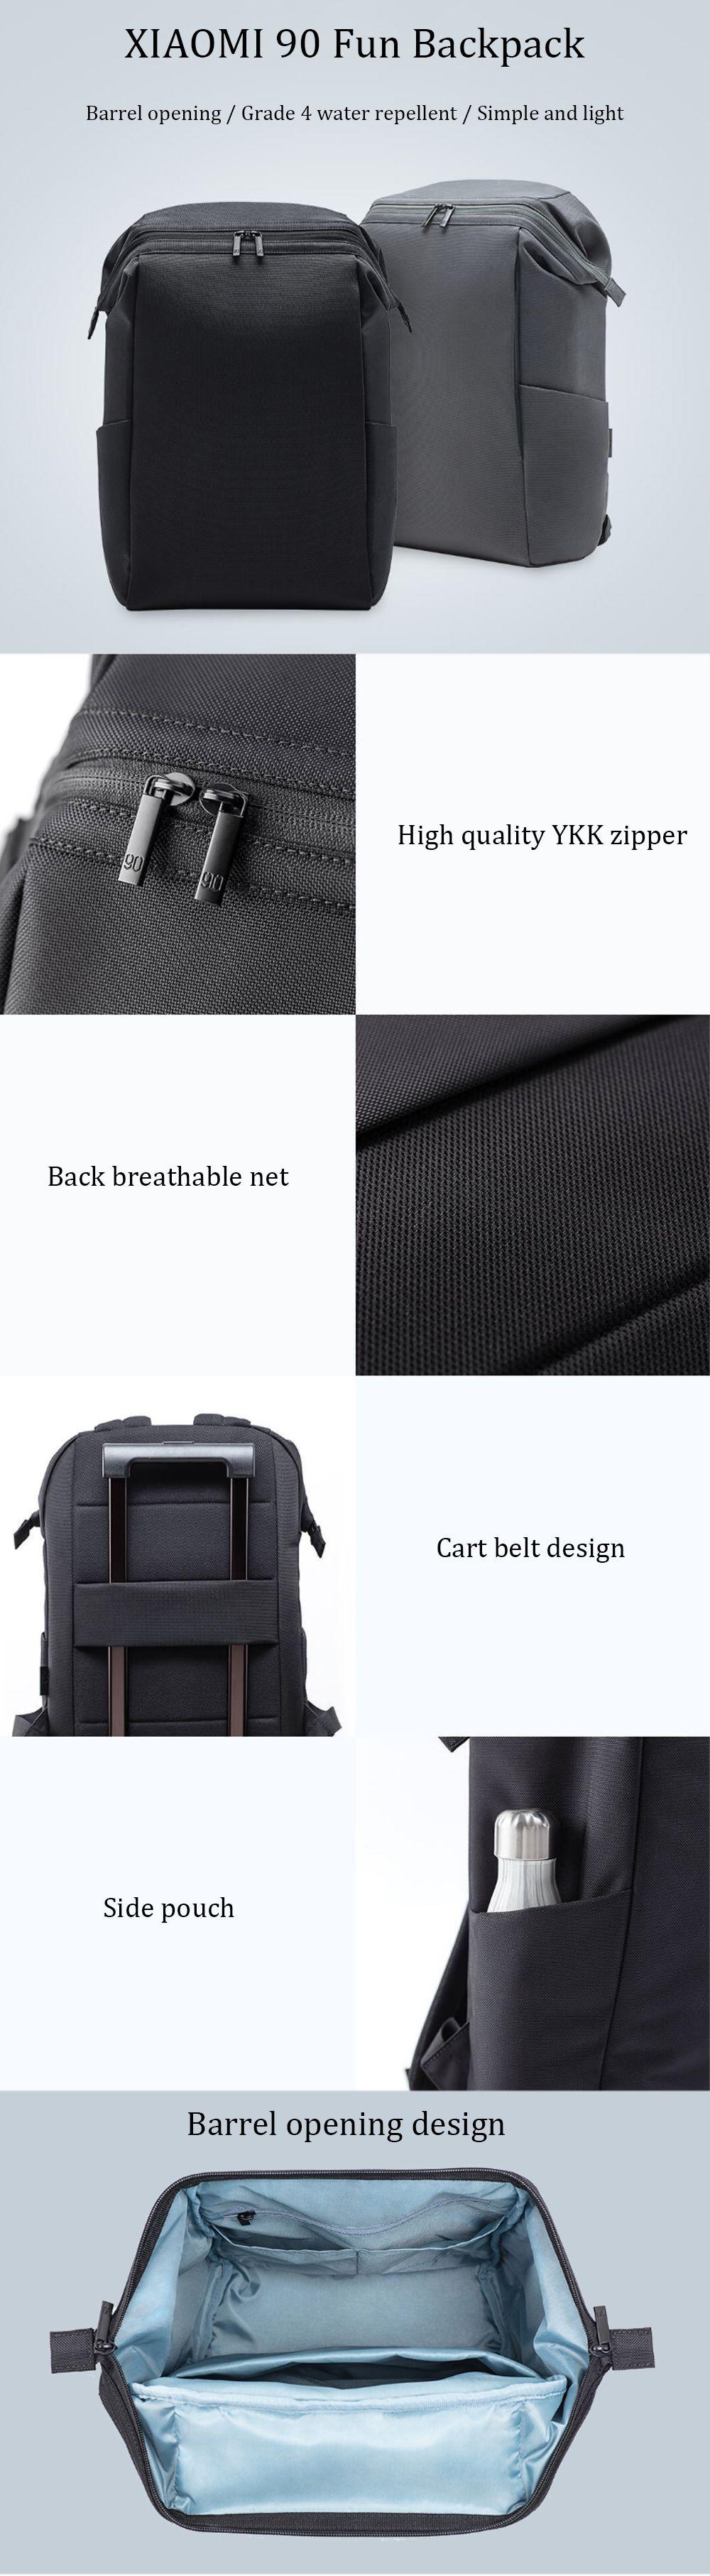 bd1594dbd9 Xiaomi 90 Fun Backpack 15.6 Inch Laptop Bag Level 4 Water Repellent Travel  Leisure Shoulder Bag  Banggood  Xiaomi  90  Fun  Backpack  15 6  Inch   Laptop ...